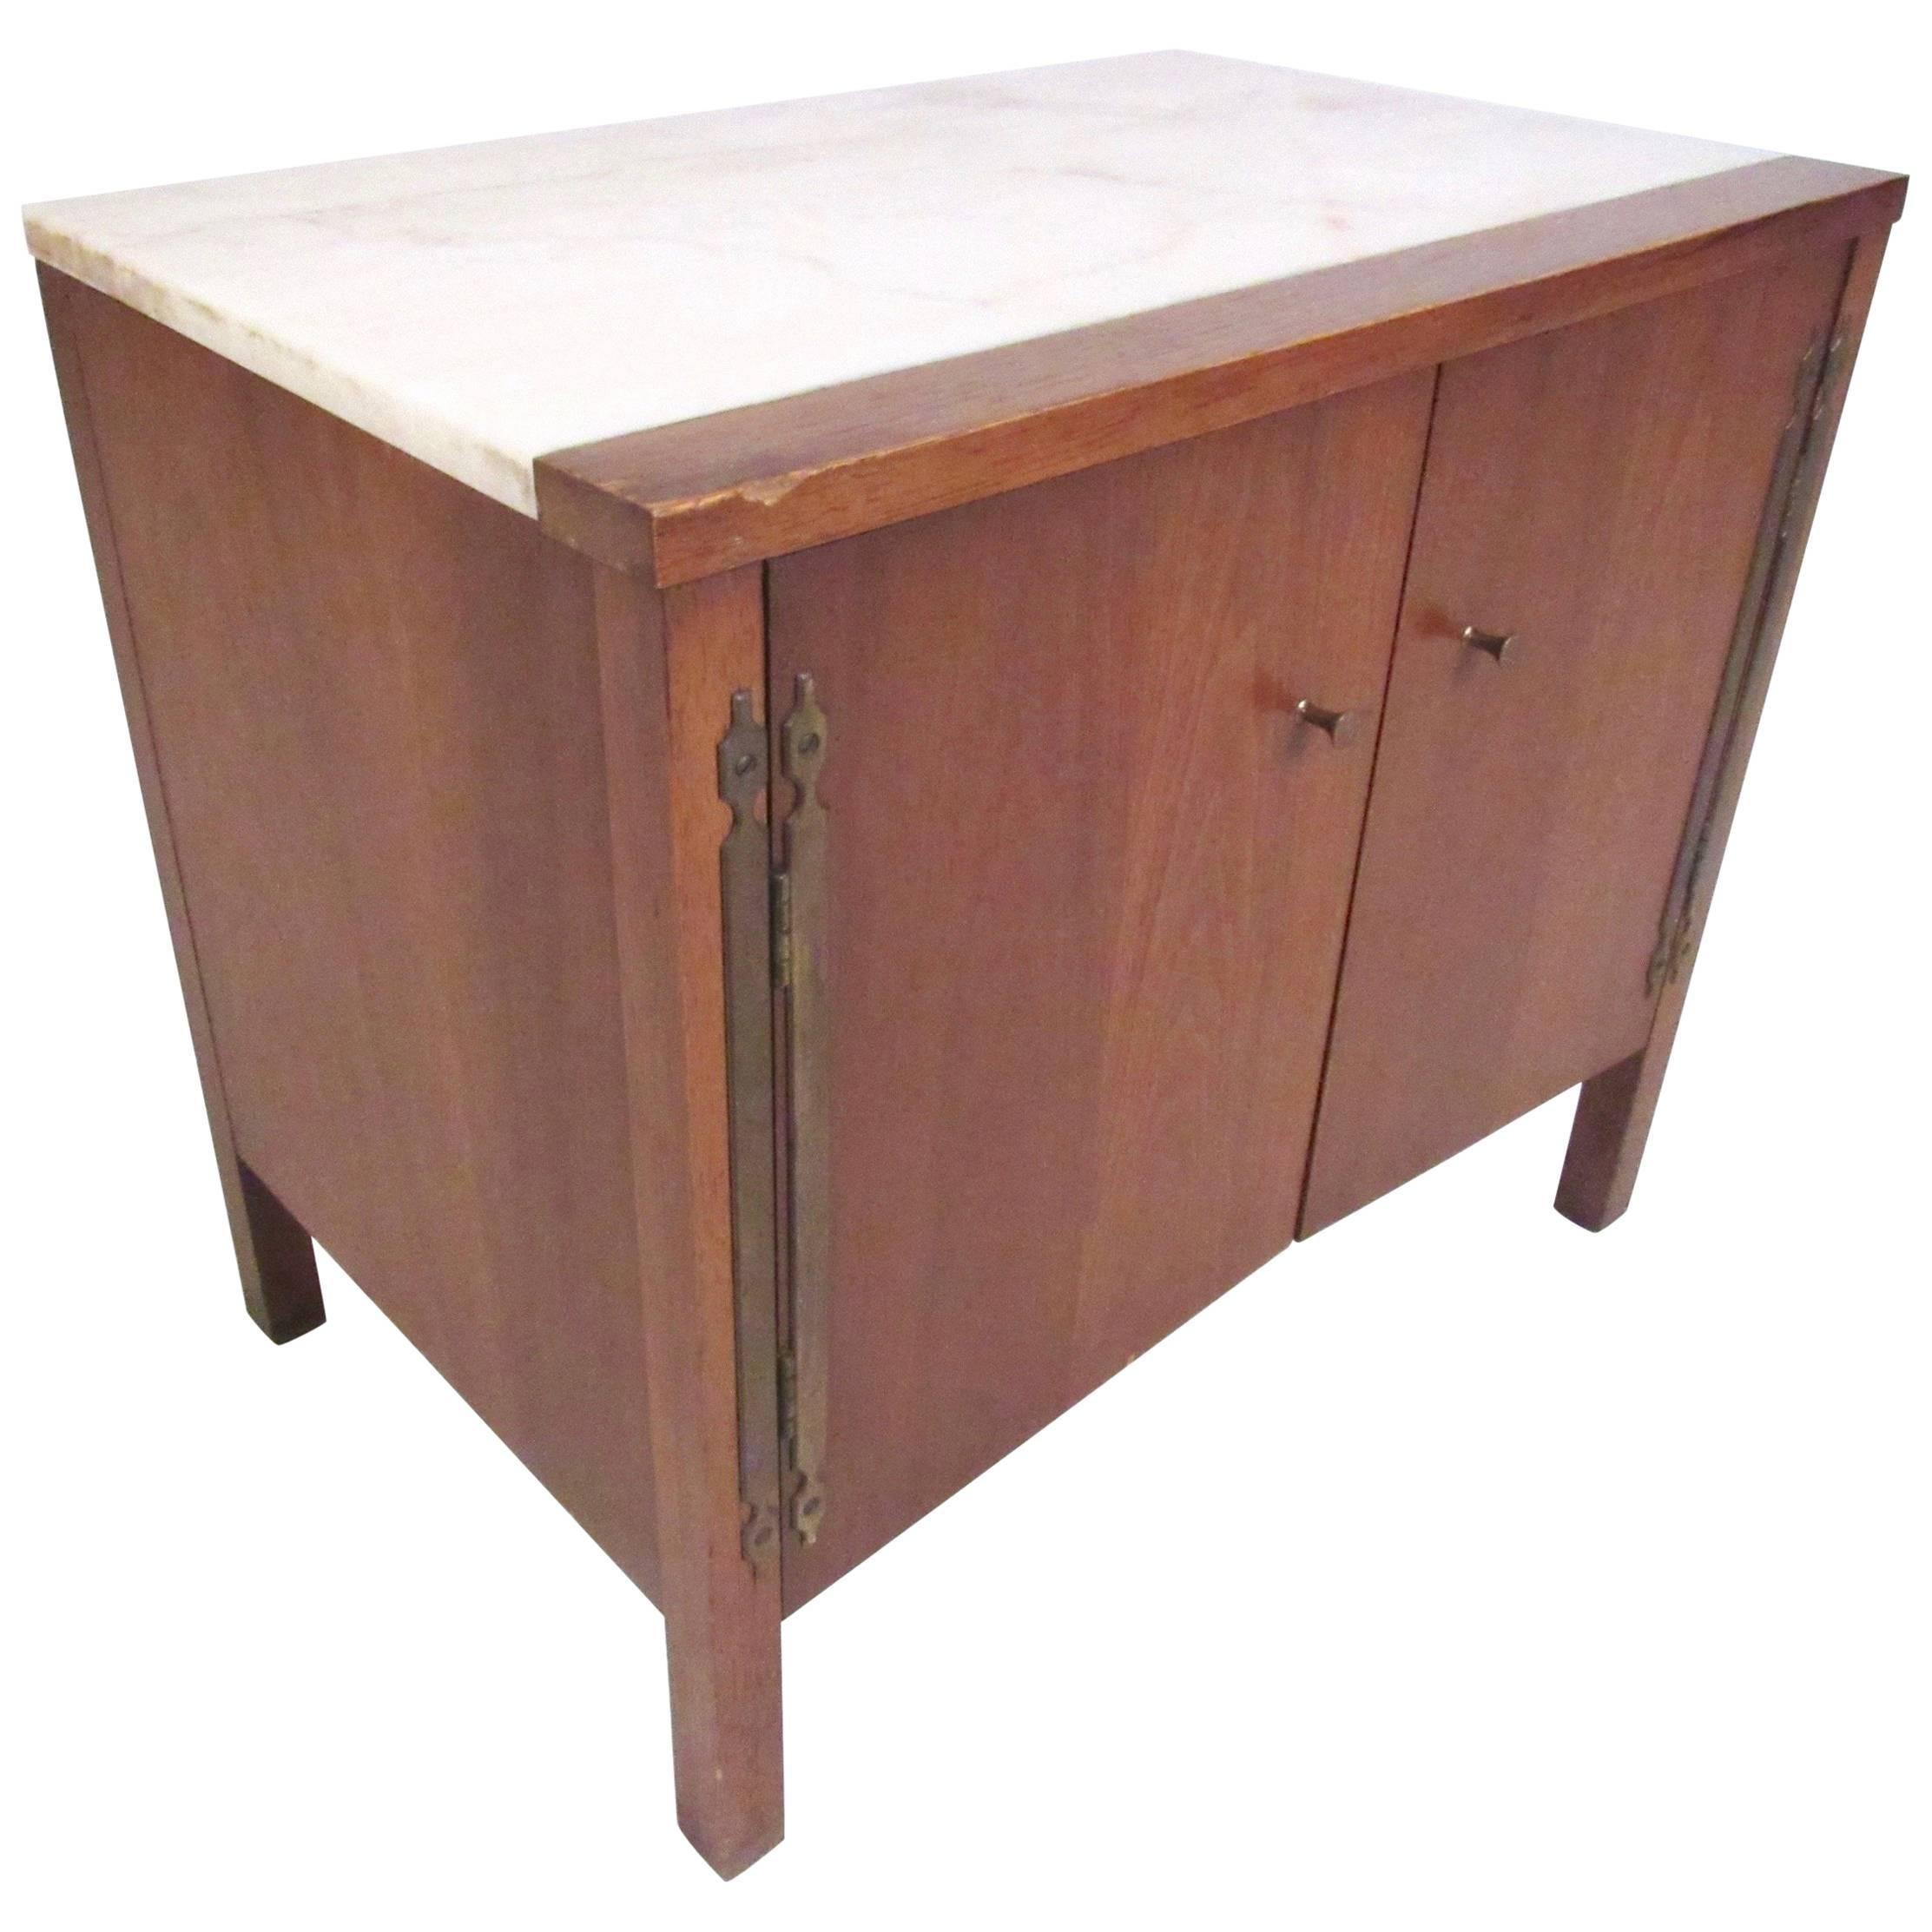 Vintage Modern Marble-Top End Table by Drexel